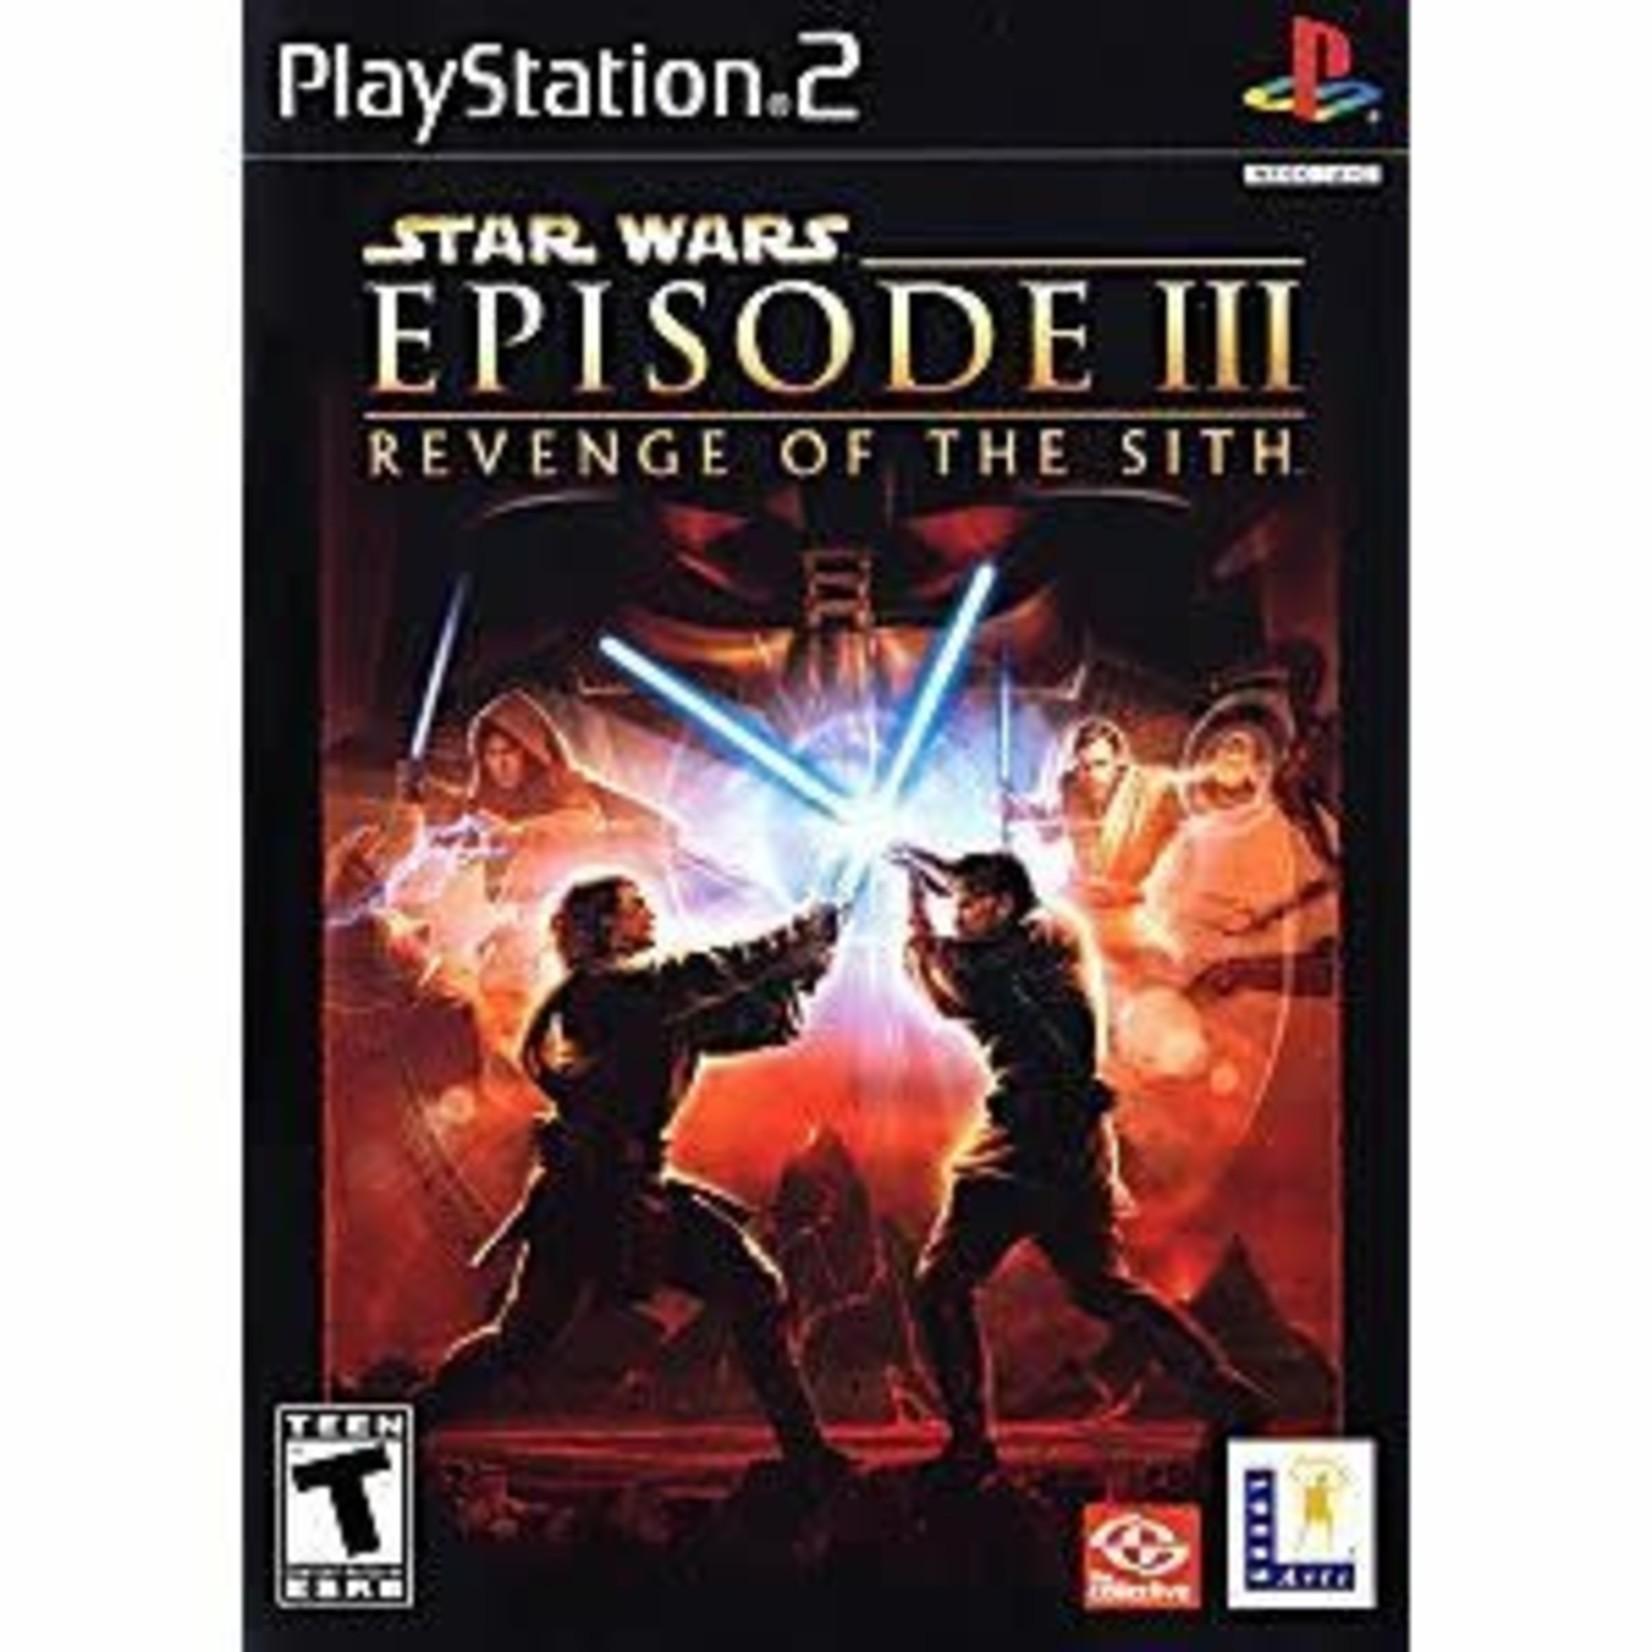 PS2U-Star Wars Episode III Revenge of the Sith